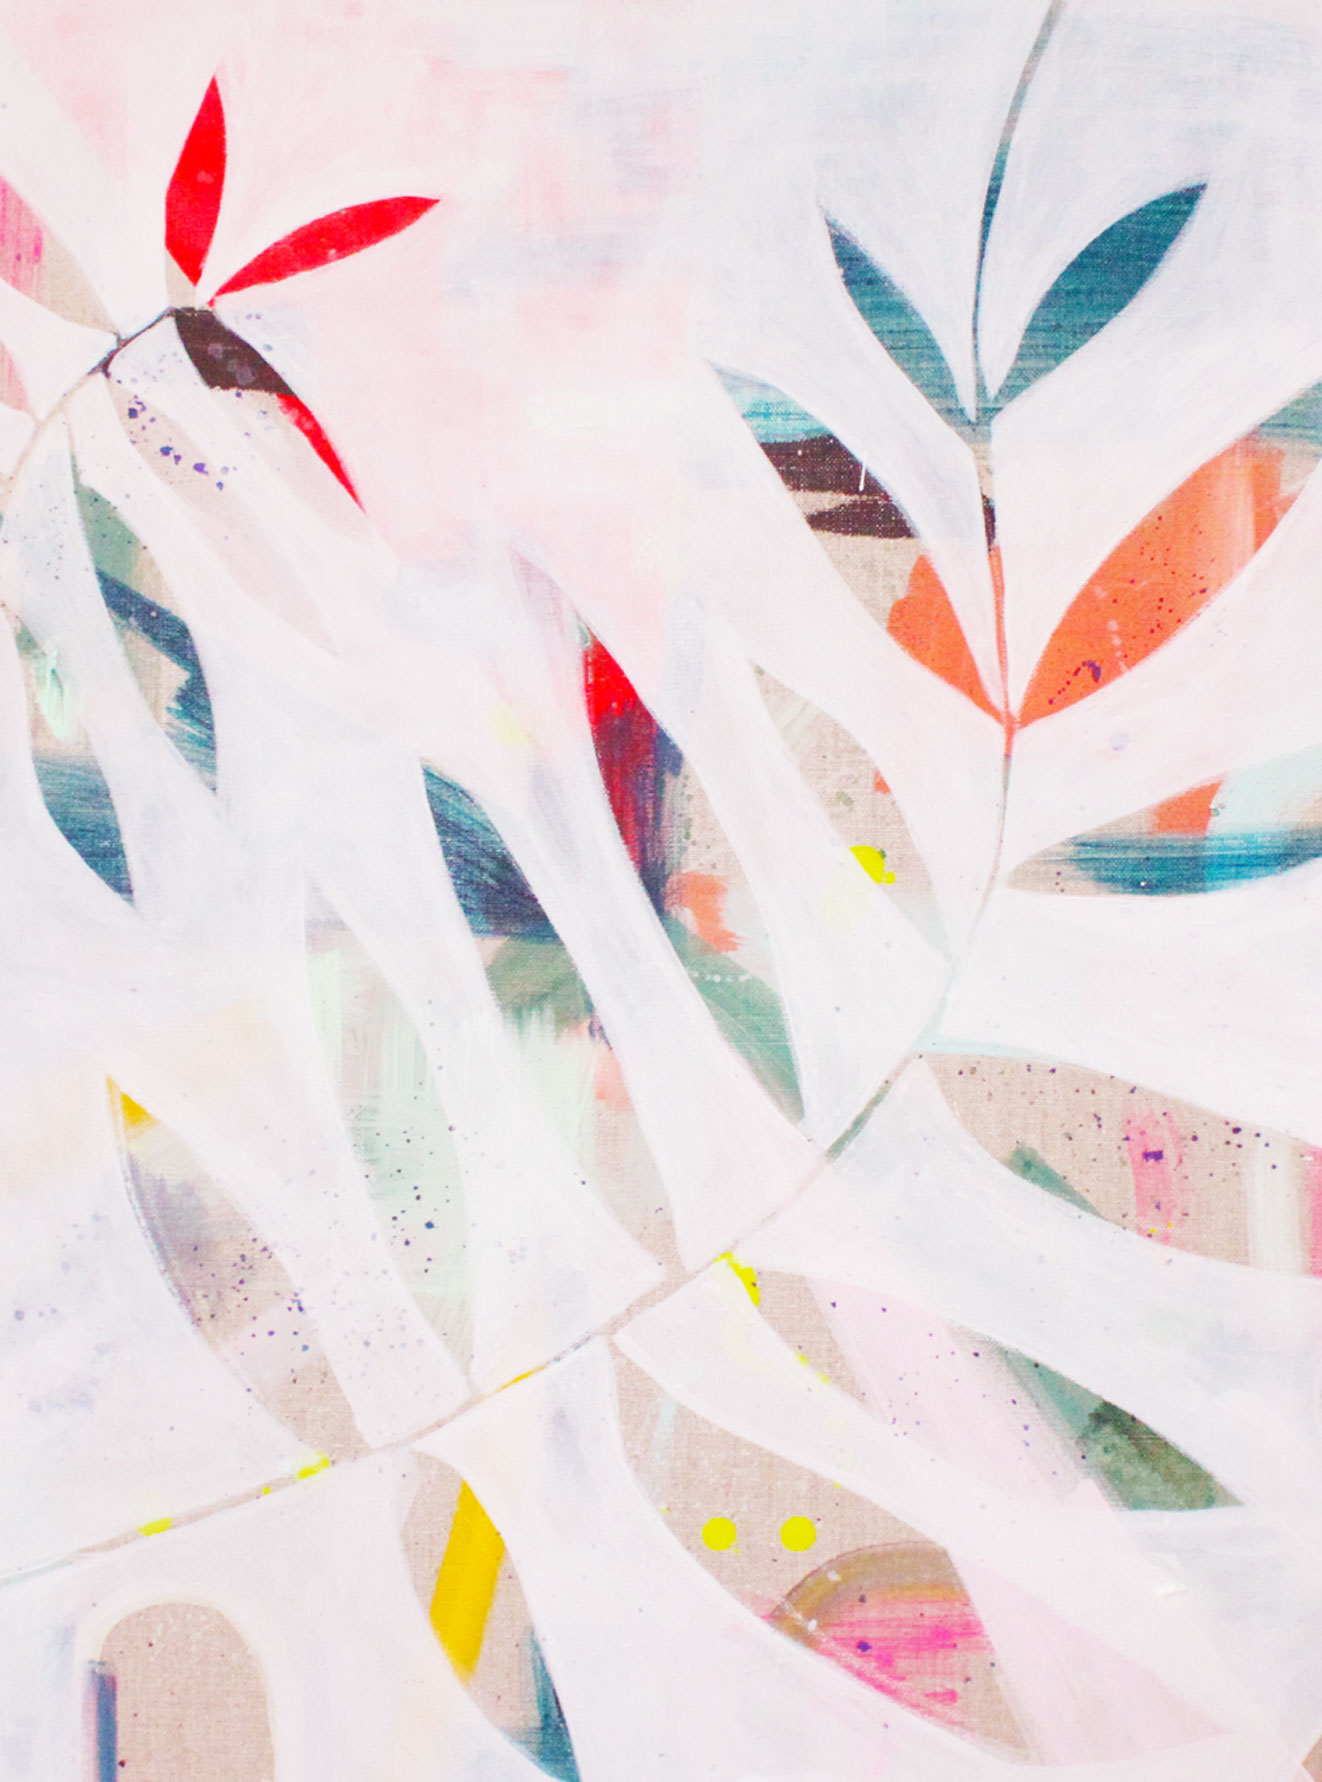 Secret Heart, acrylic and gouache on linen canvas